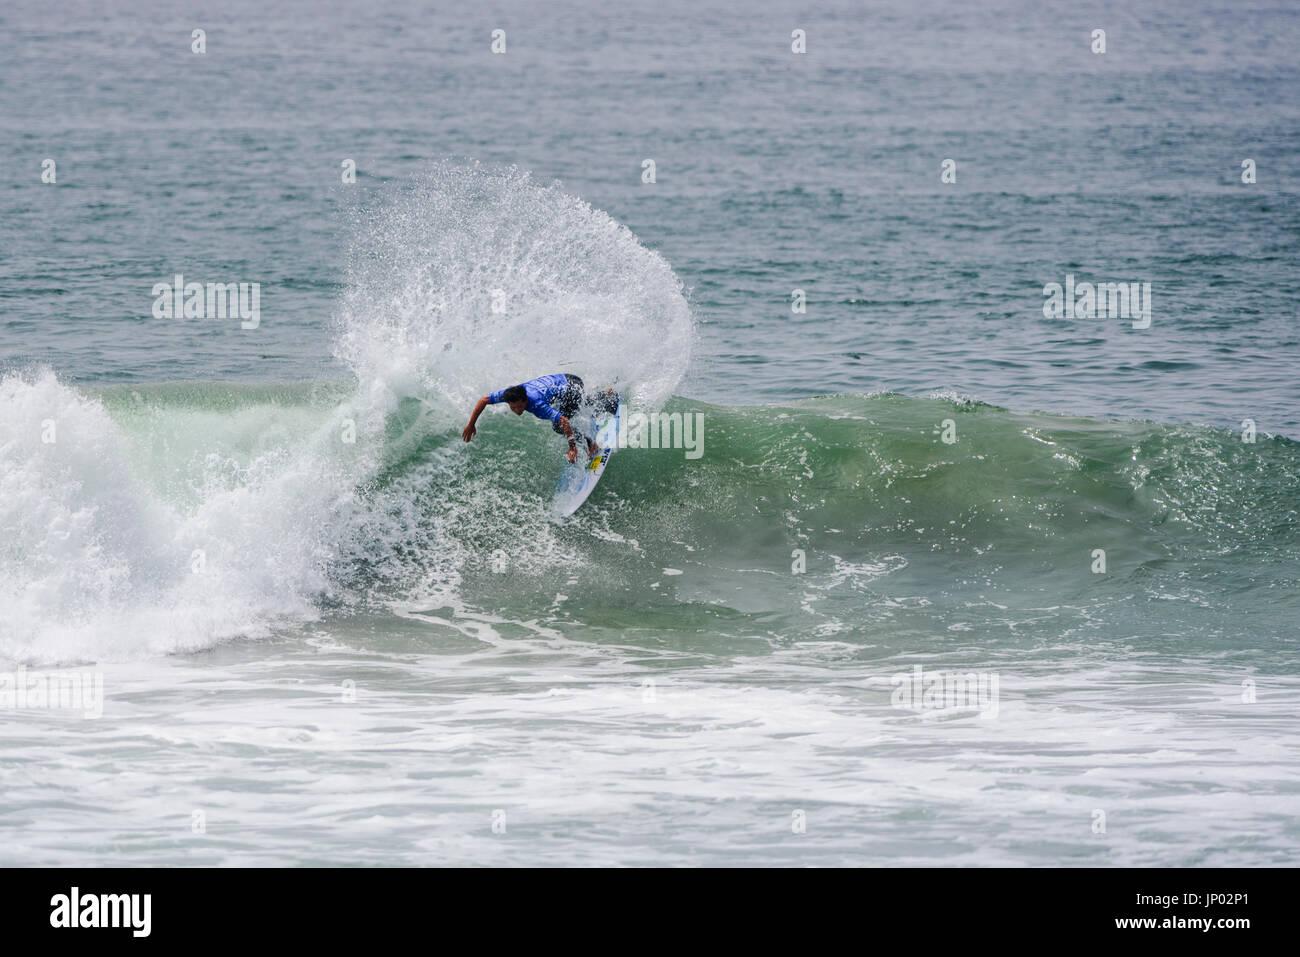 9378165dfd huntington-beach-usa-31-july -2017-former-champion-hiroto-ohhara-jpn-JP02P1.jpg